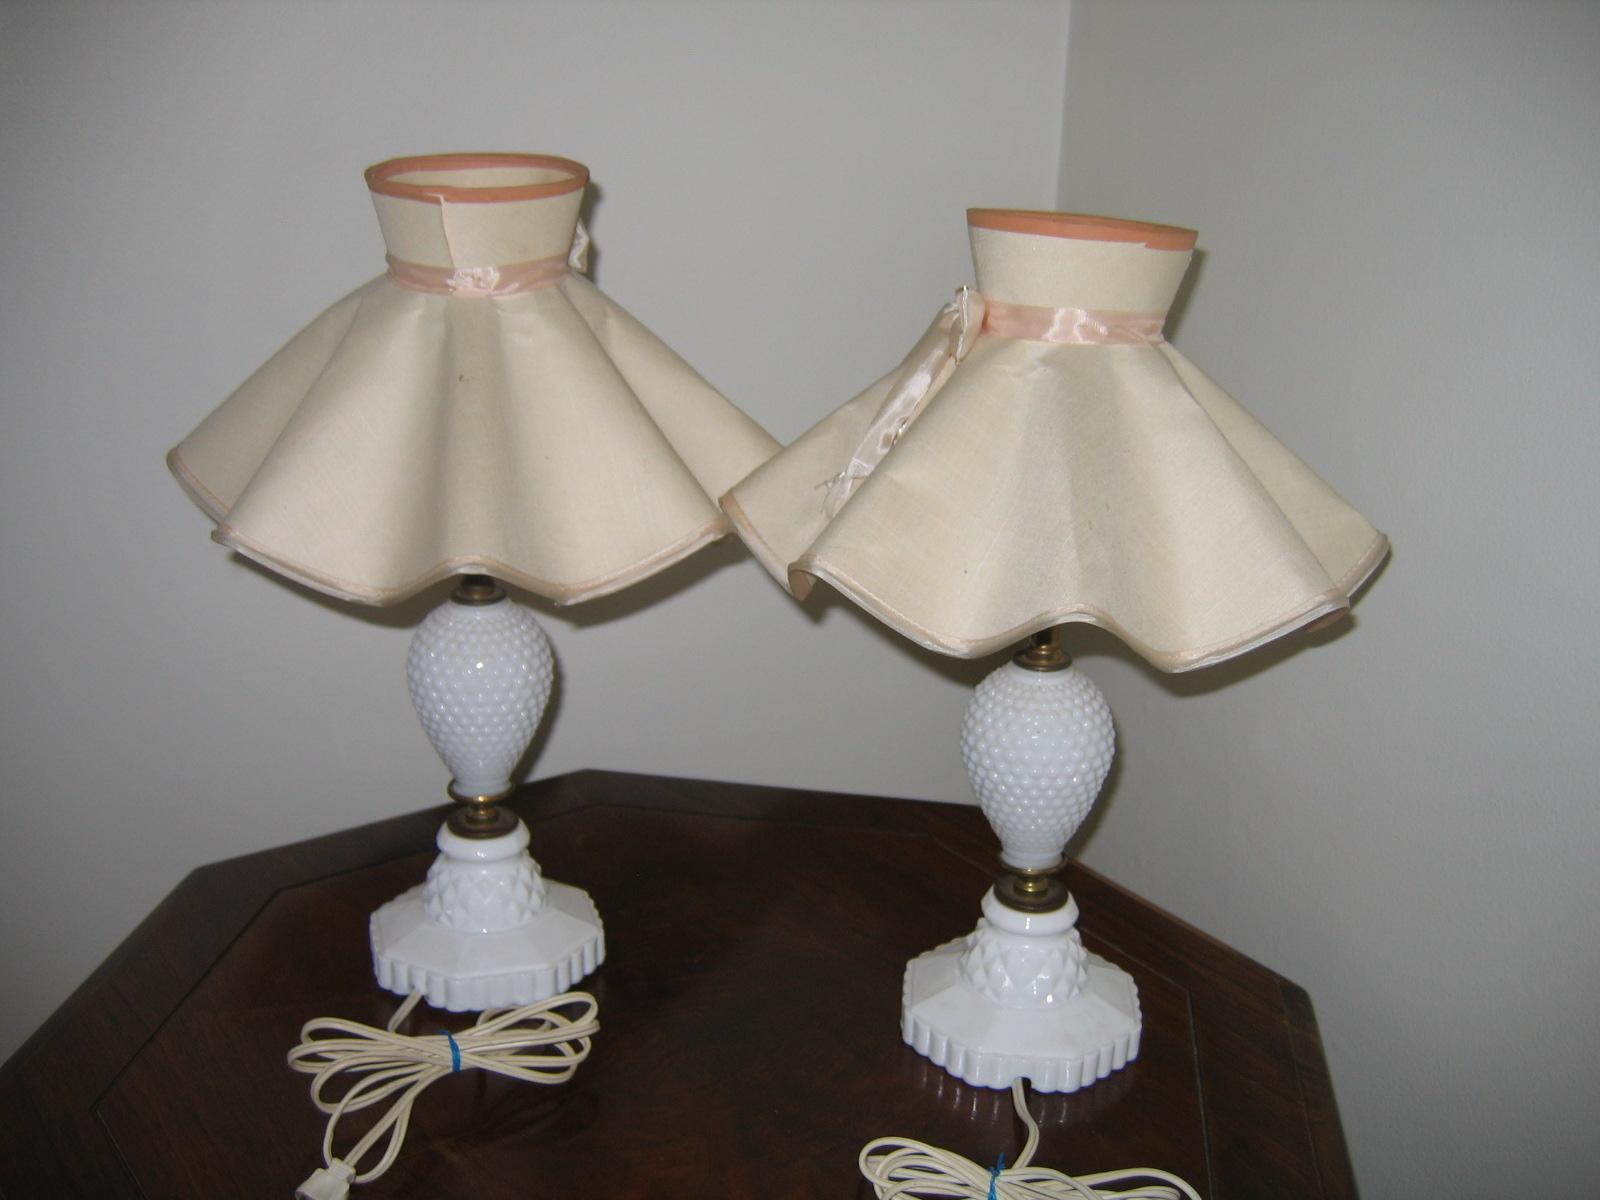 Vintage Matching Milk Glass Bedroom Lamps Item #772 For Sale ...